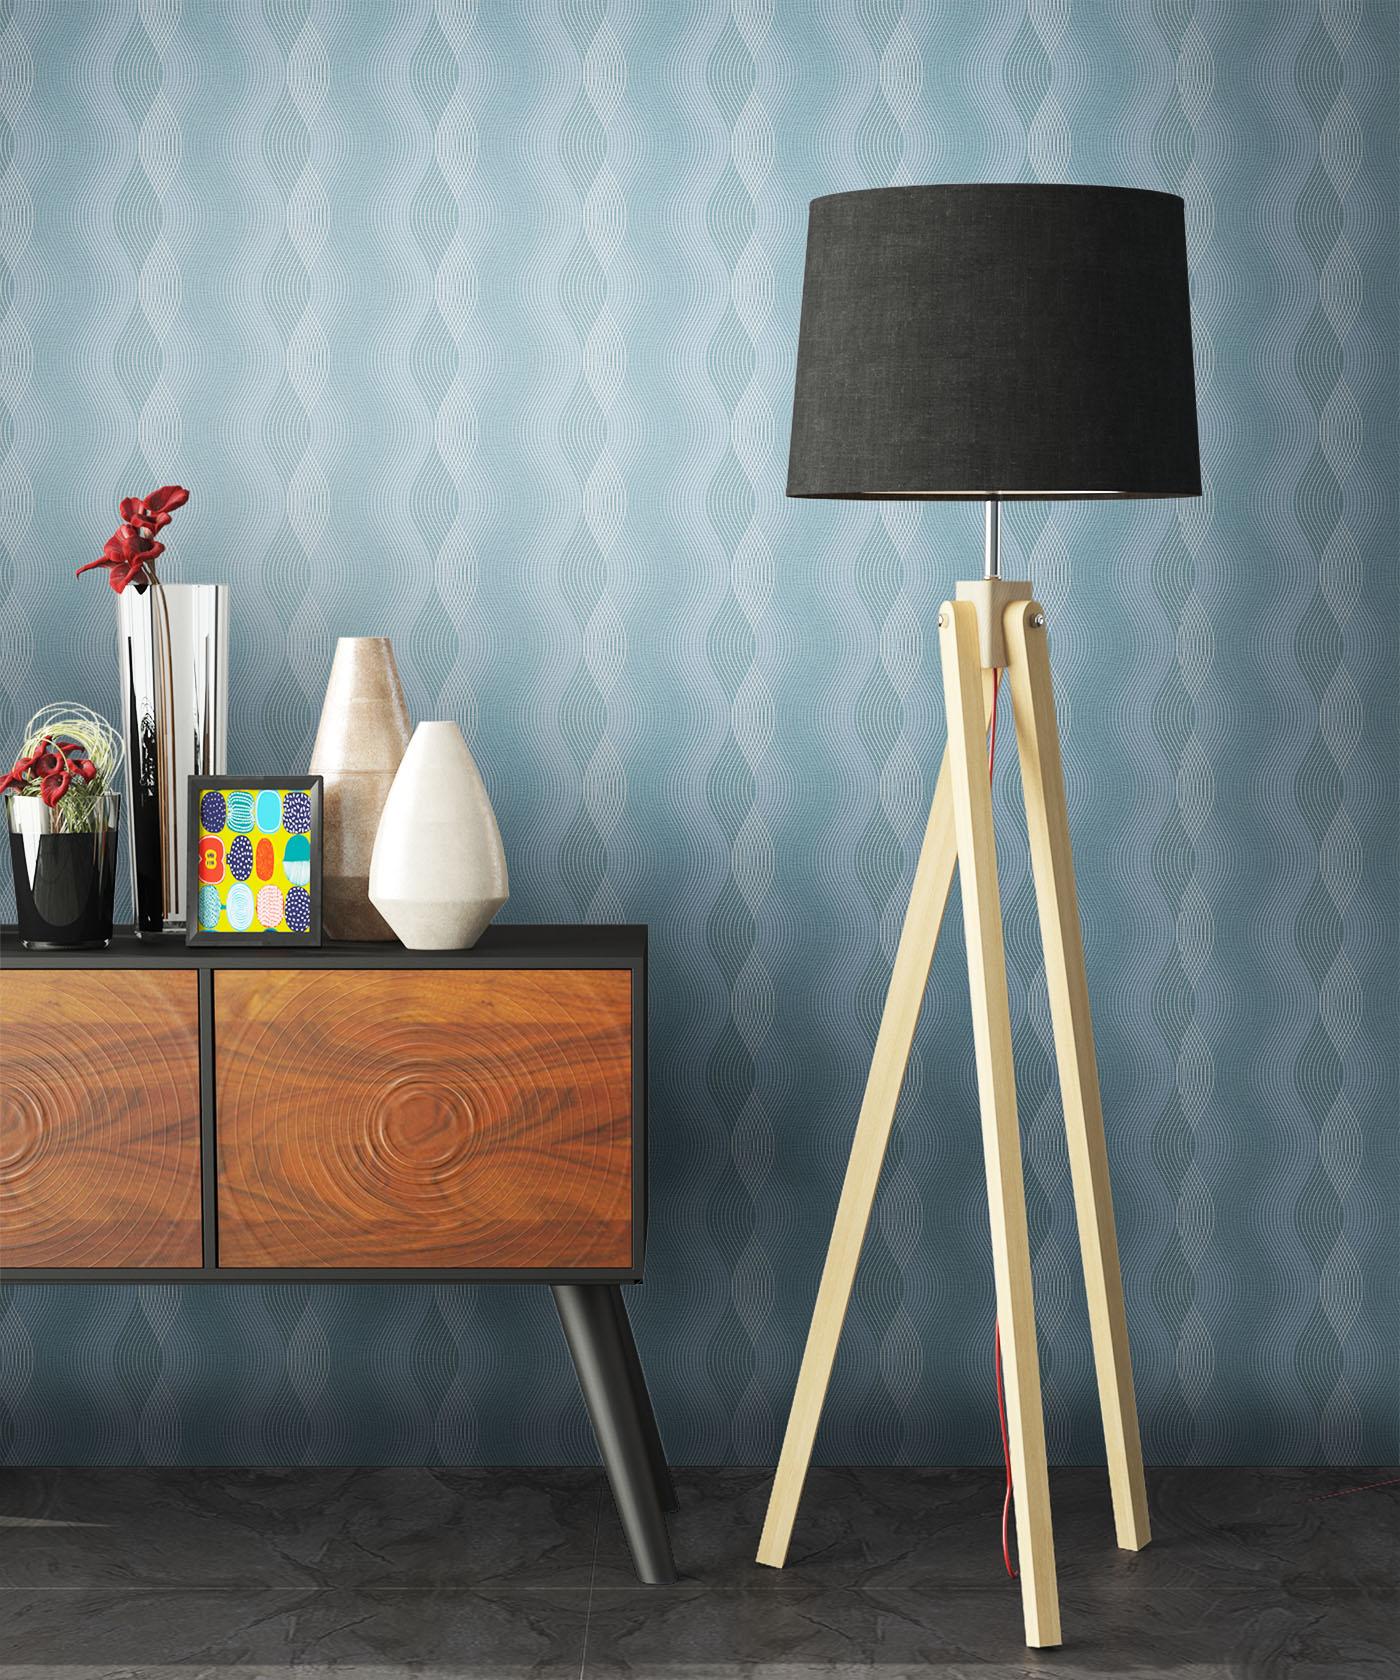 newroom tapete blau grafik modern streifen vlies wei 3d. Black Bedroom Furniture Sets. Home Design Ideas